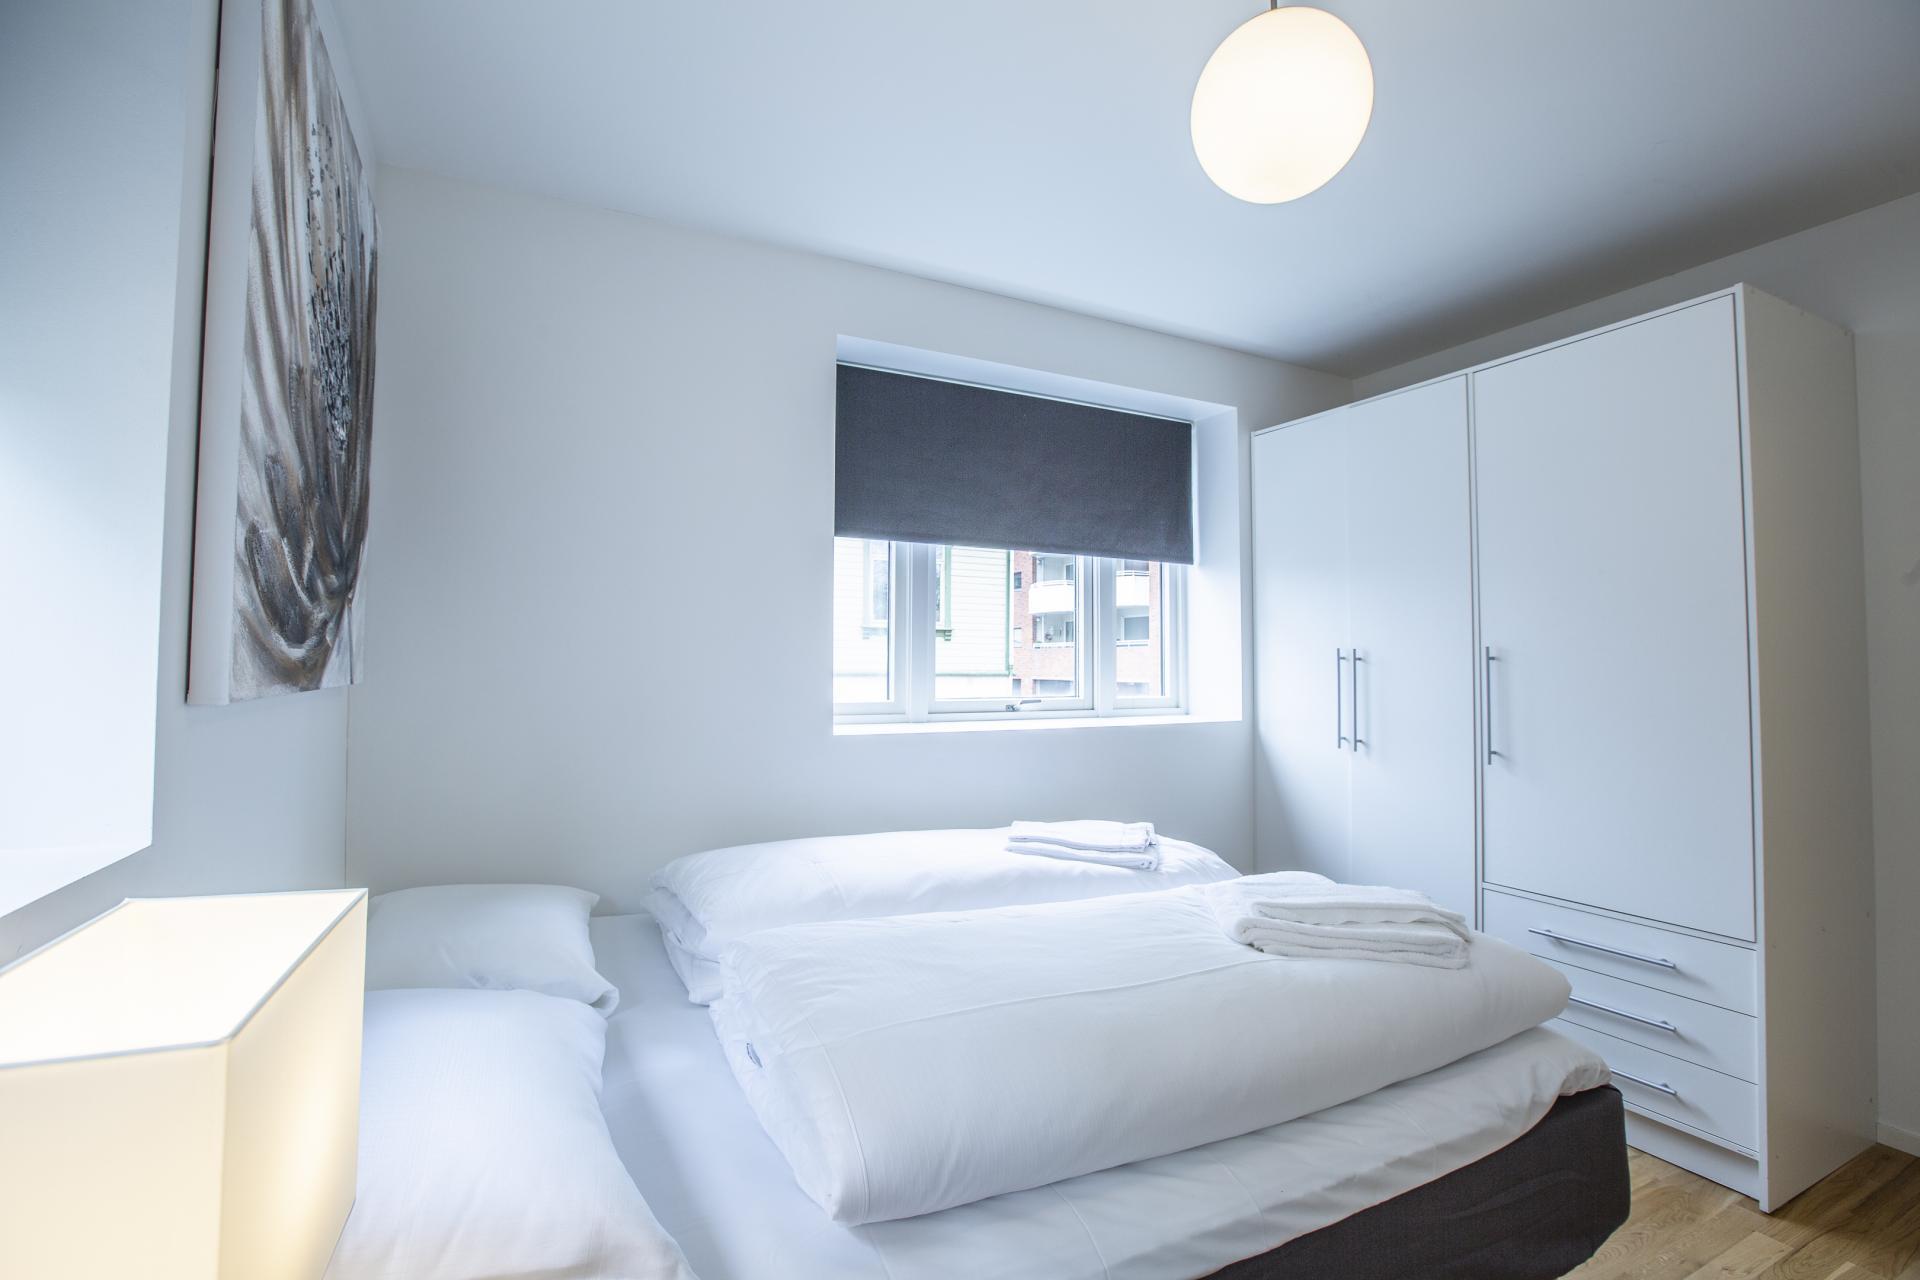 Bedding at Saudagata 9 Apartment, Lagard, Stavanger